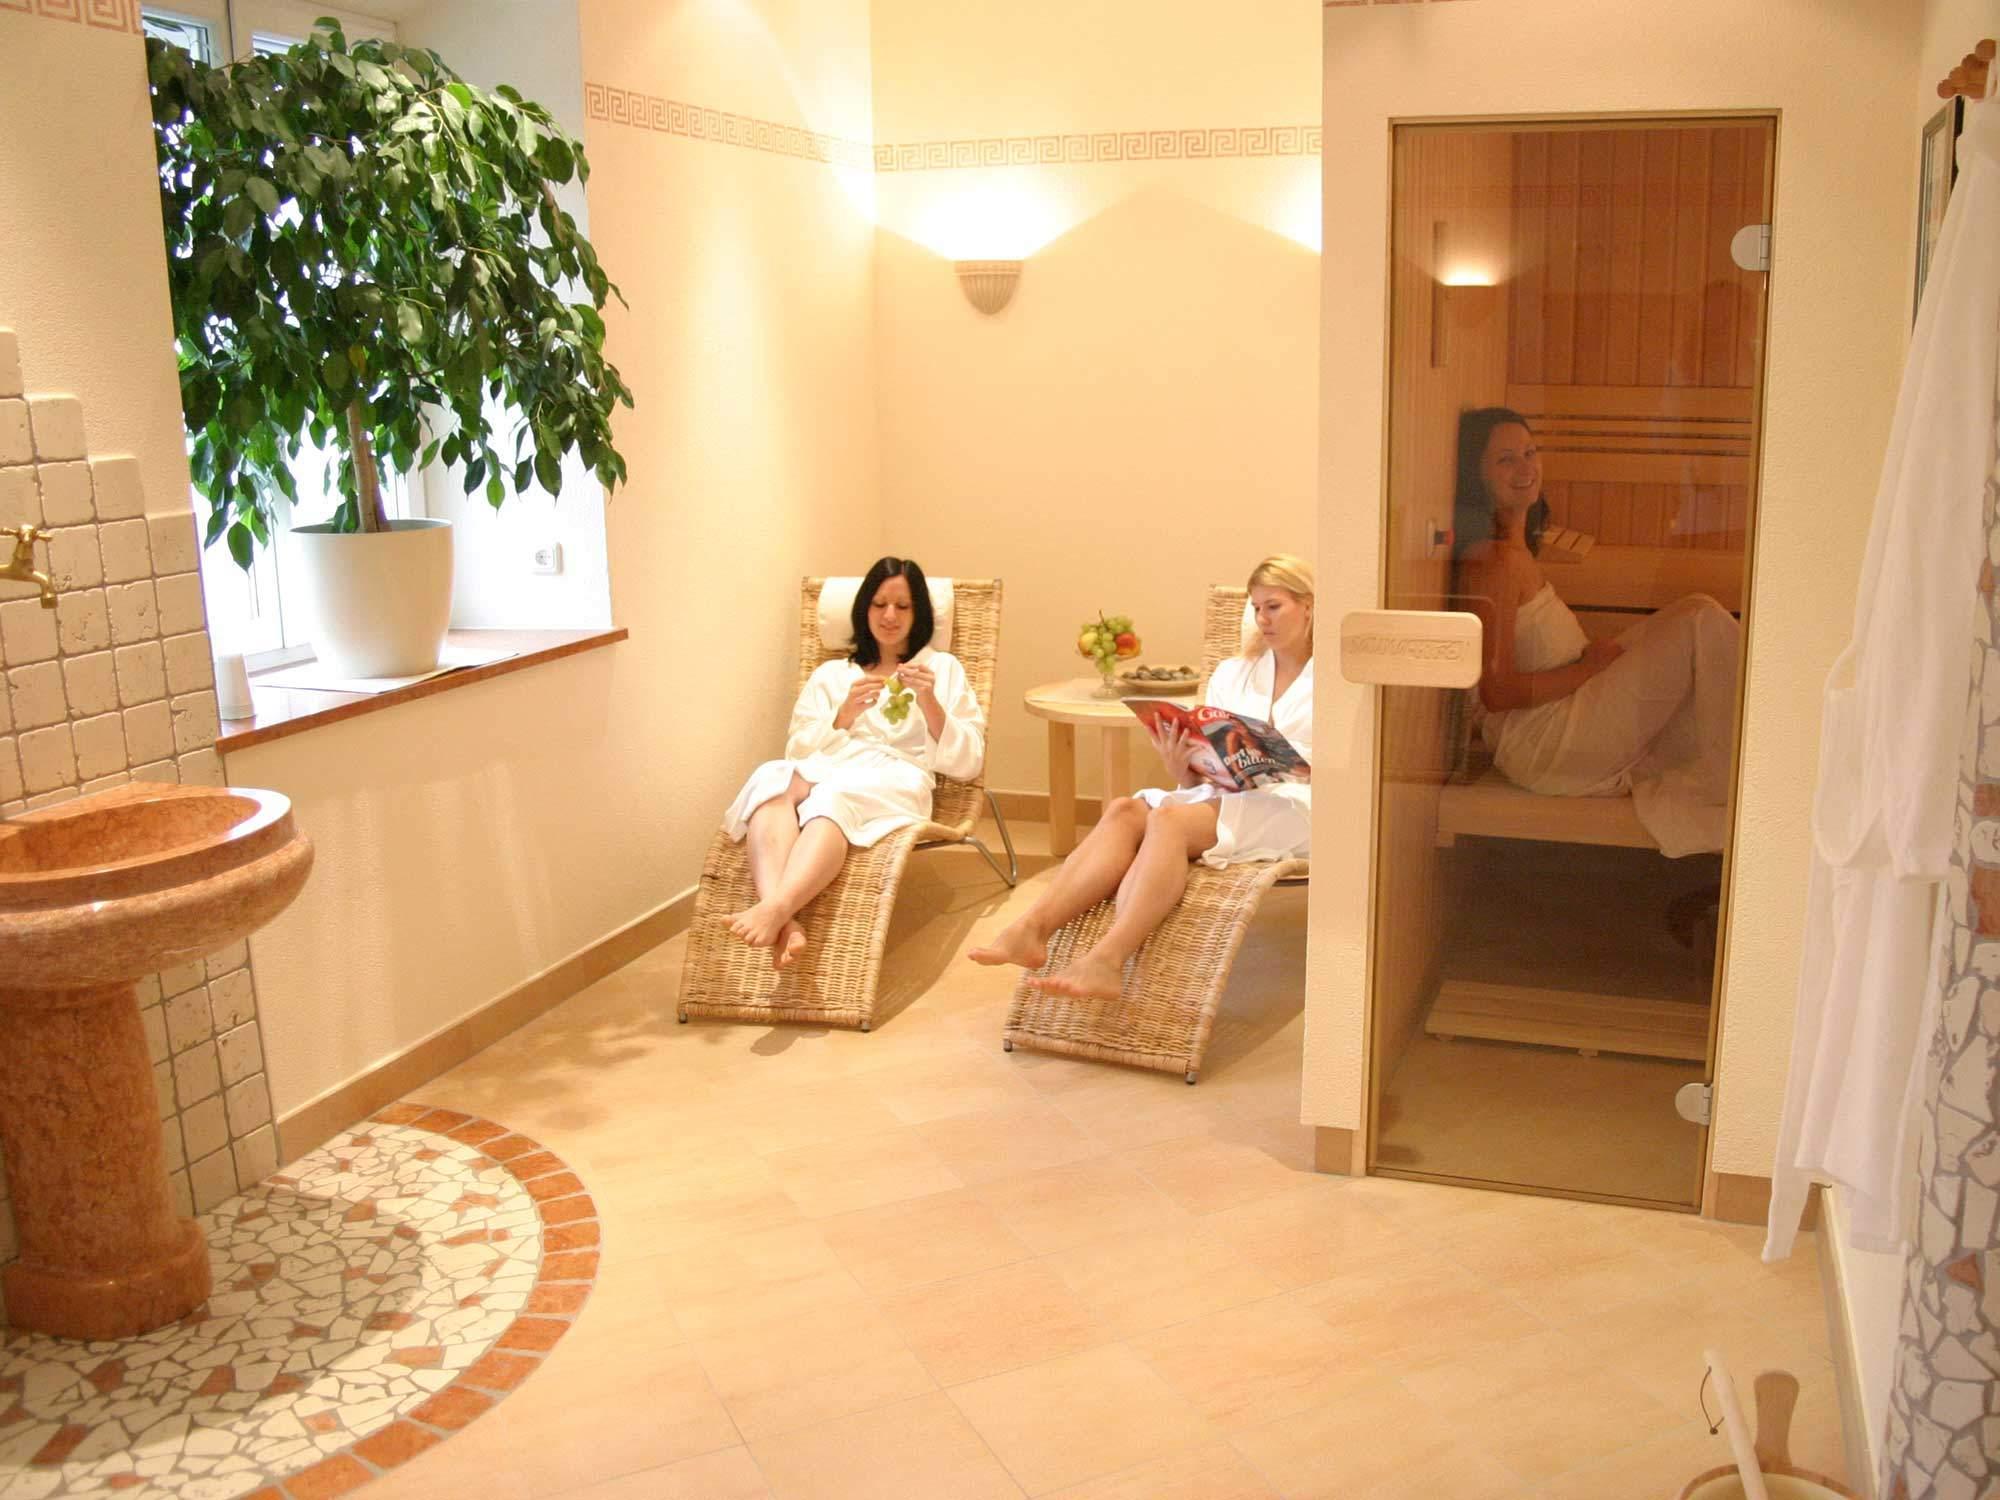 Finnische Sauna - Austria Classic Hotel Heiligkreuz Hall bei Innsbruck